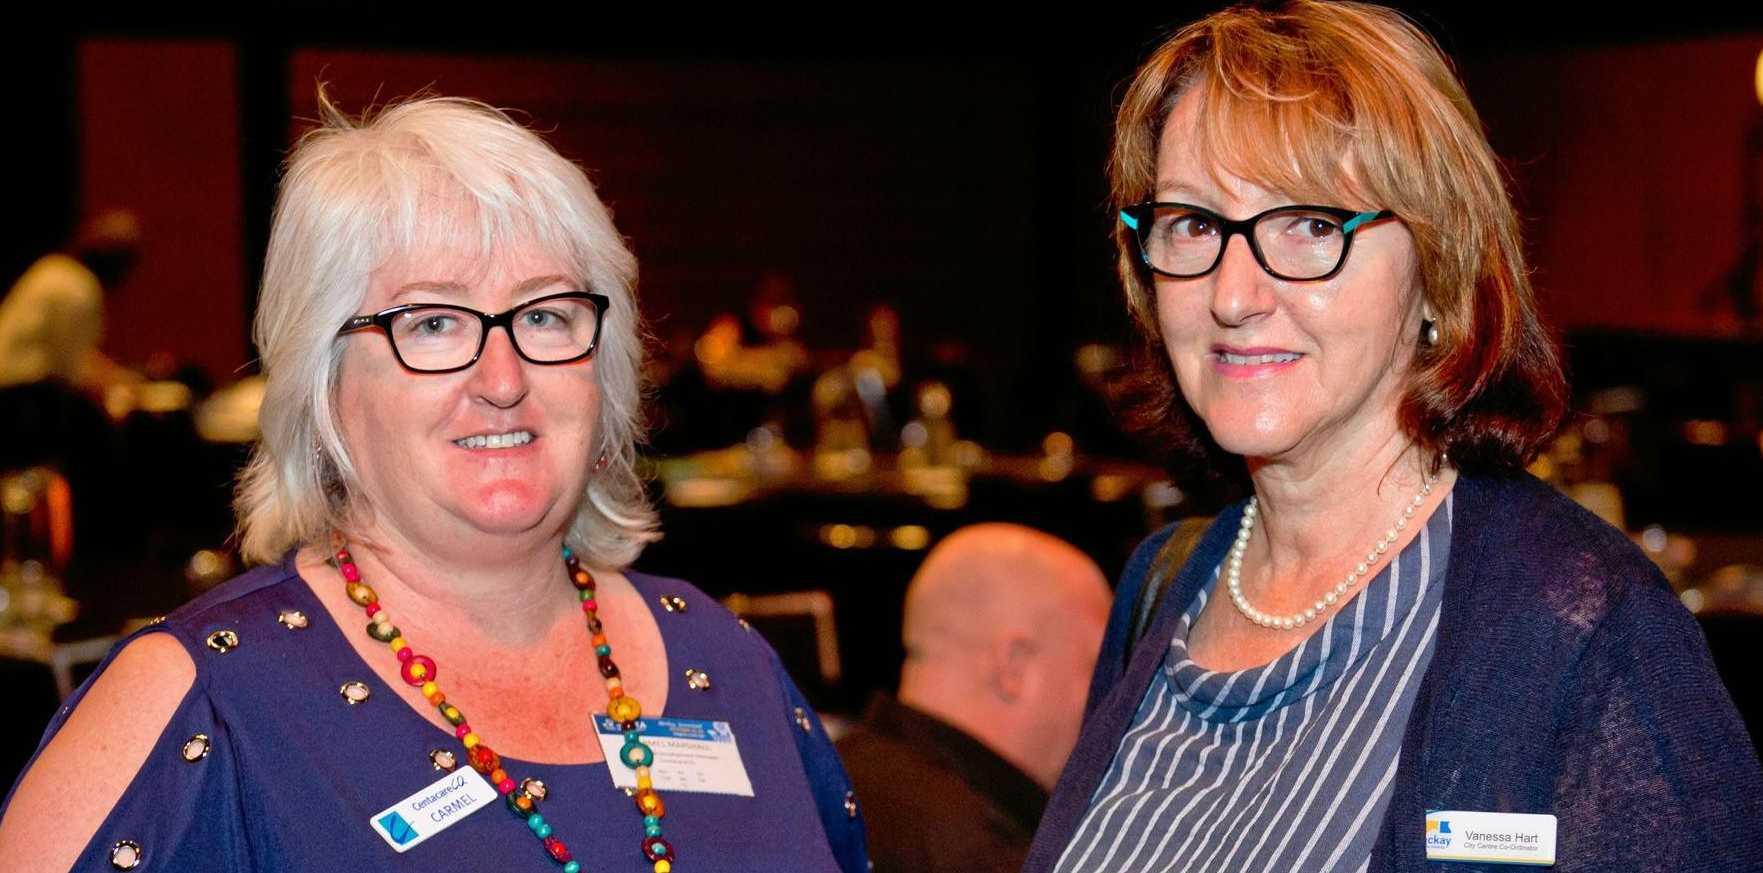 Carmel Marshall and Vanessa Hart at the SEGRA conference in Mackay.